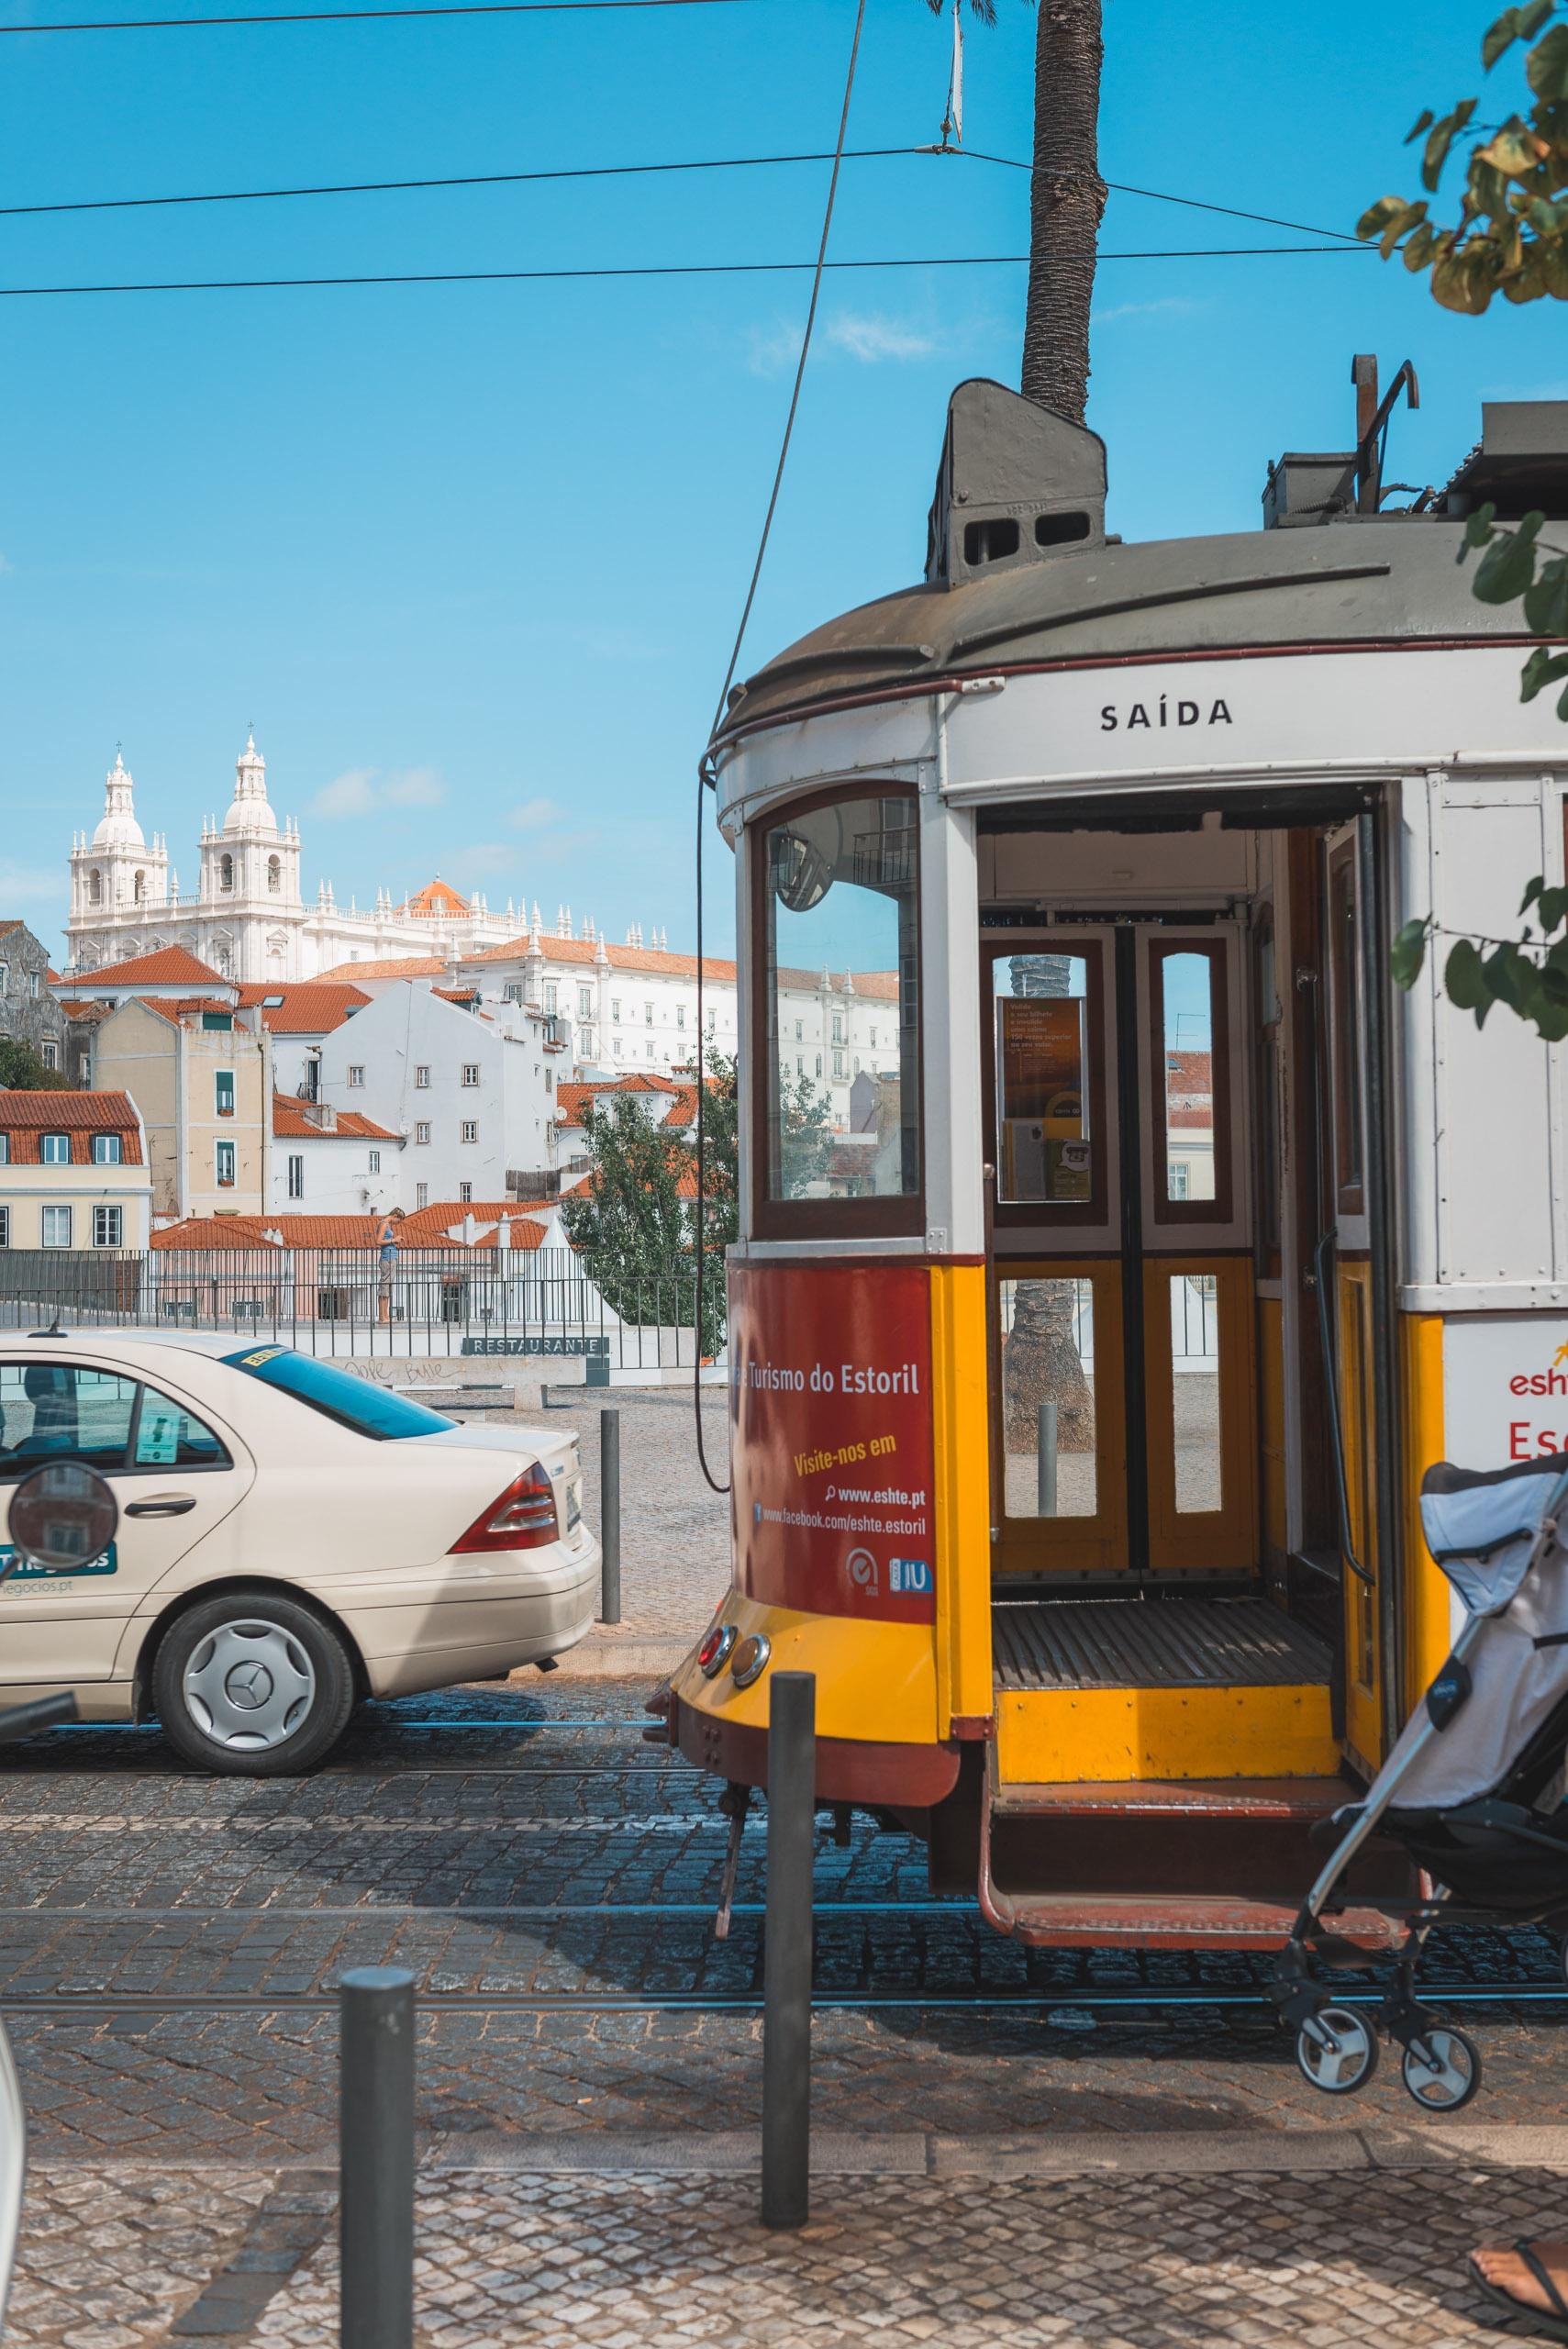 Portugal - Lisbon - 2012-0921-DSC_1404_46778